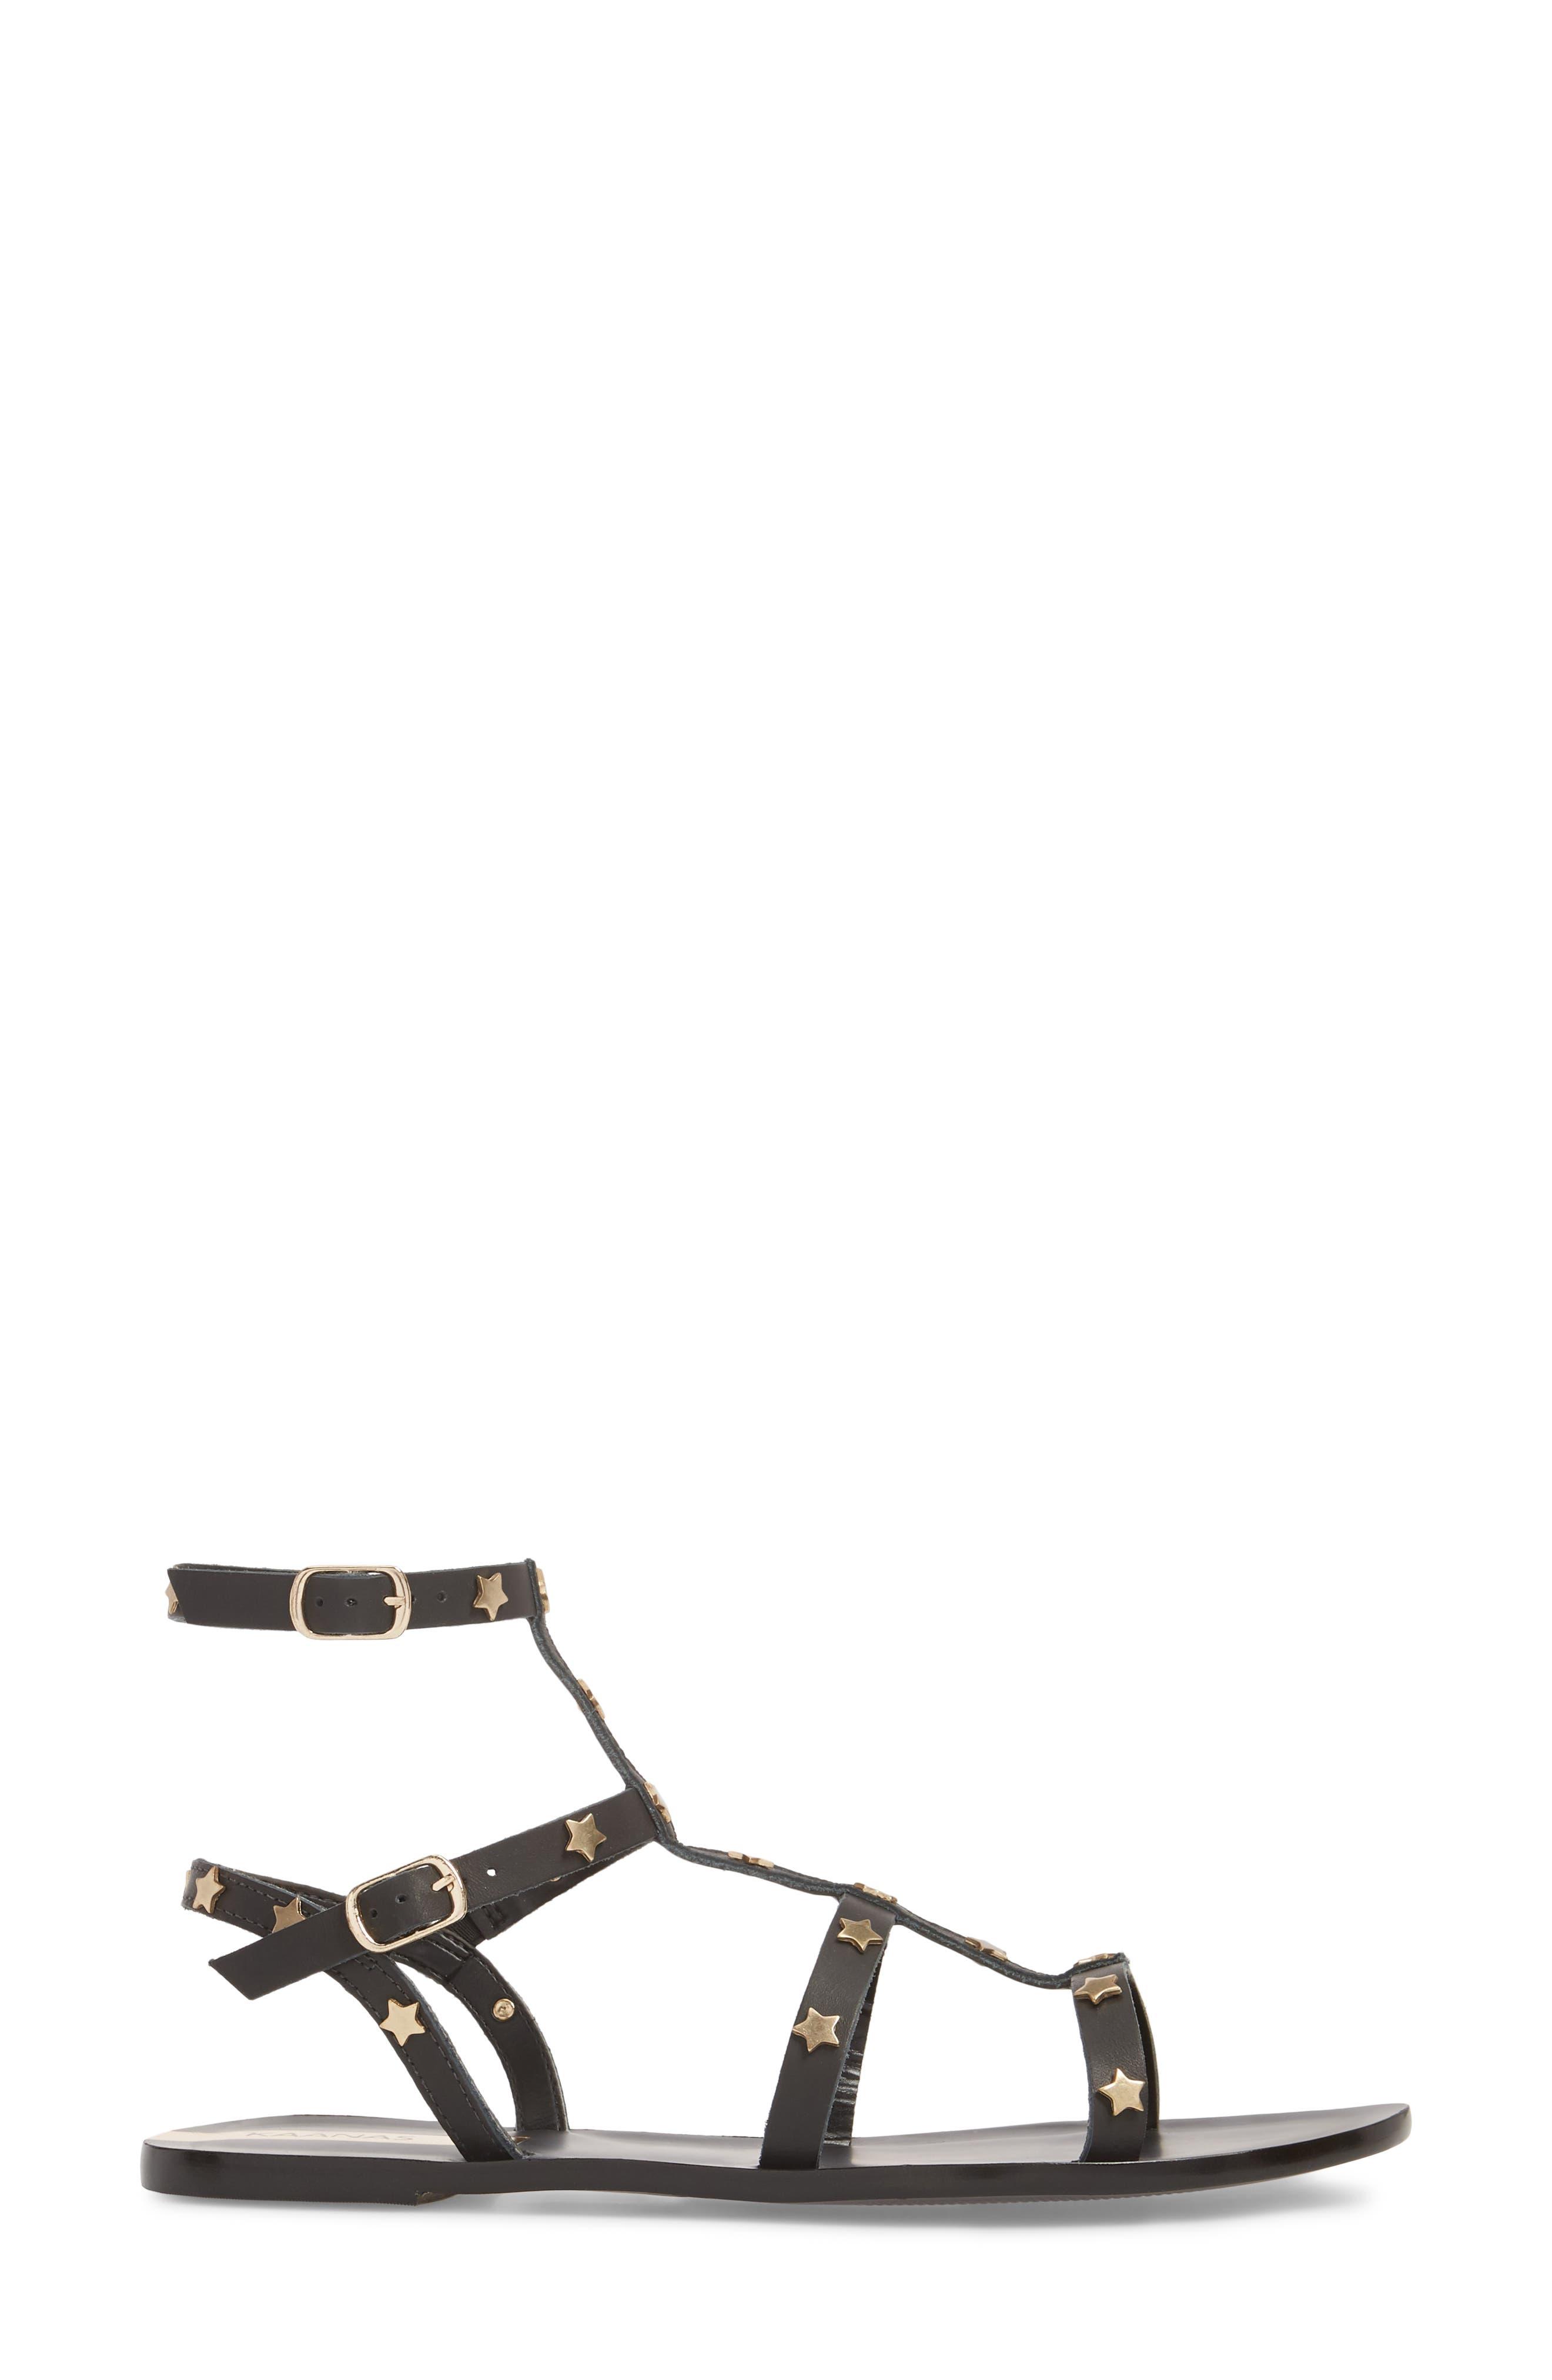 KAANAS,                             Lapa Gladiator Sandal,                             Alternate thumbnail 3, color,                             001